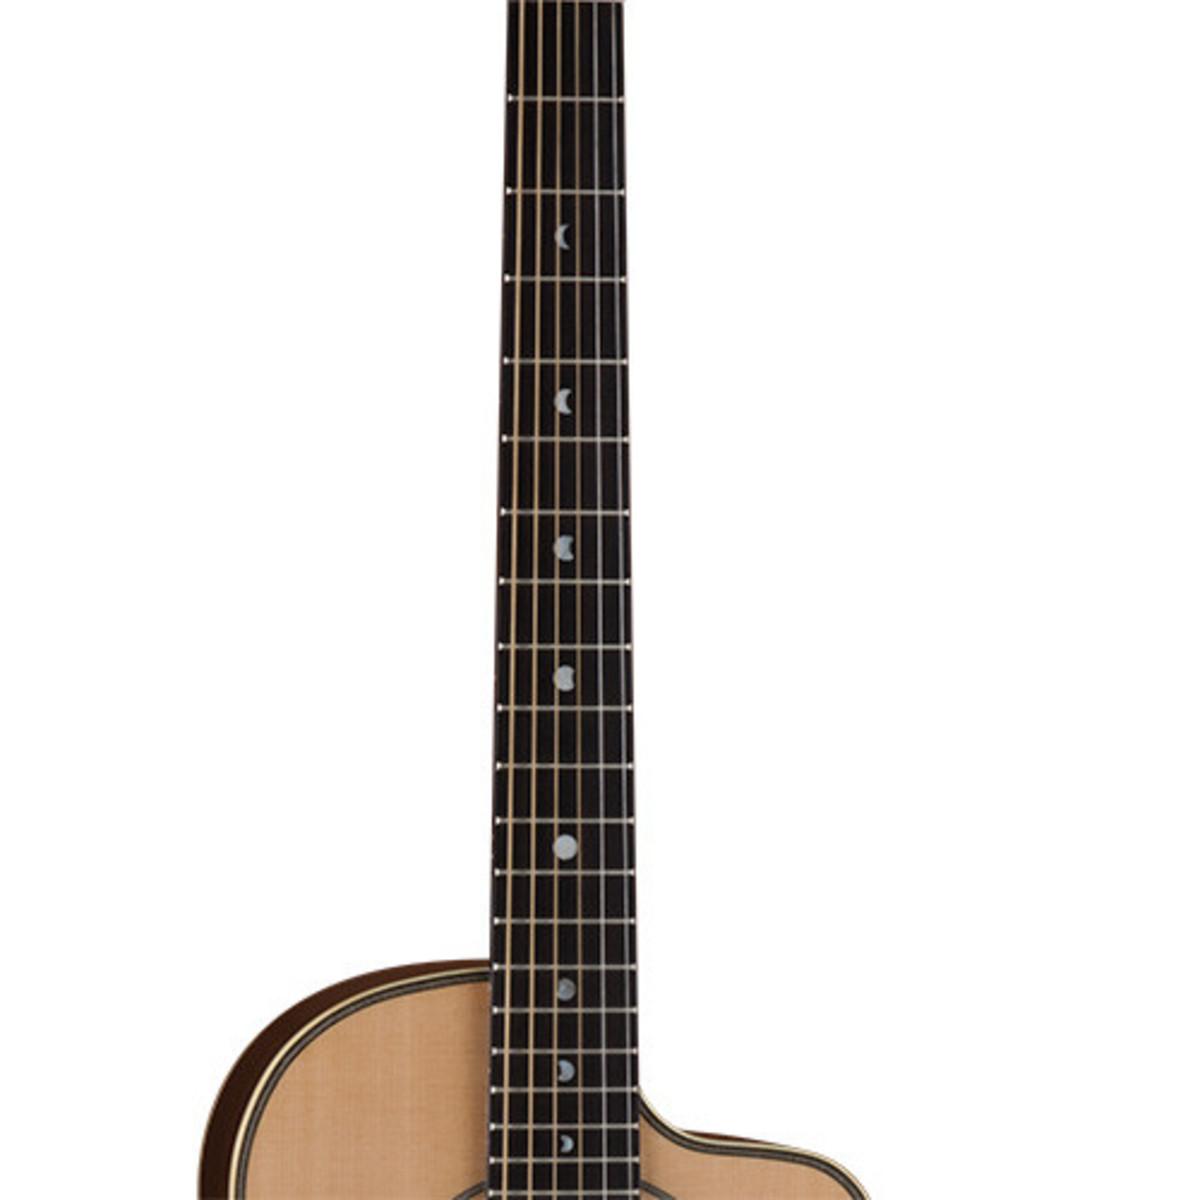 DISC Luna Americana Parlor Cutaway Electro Acoustic Guitar